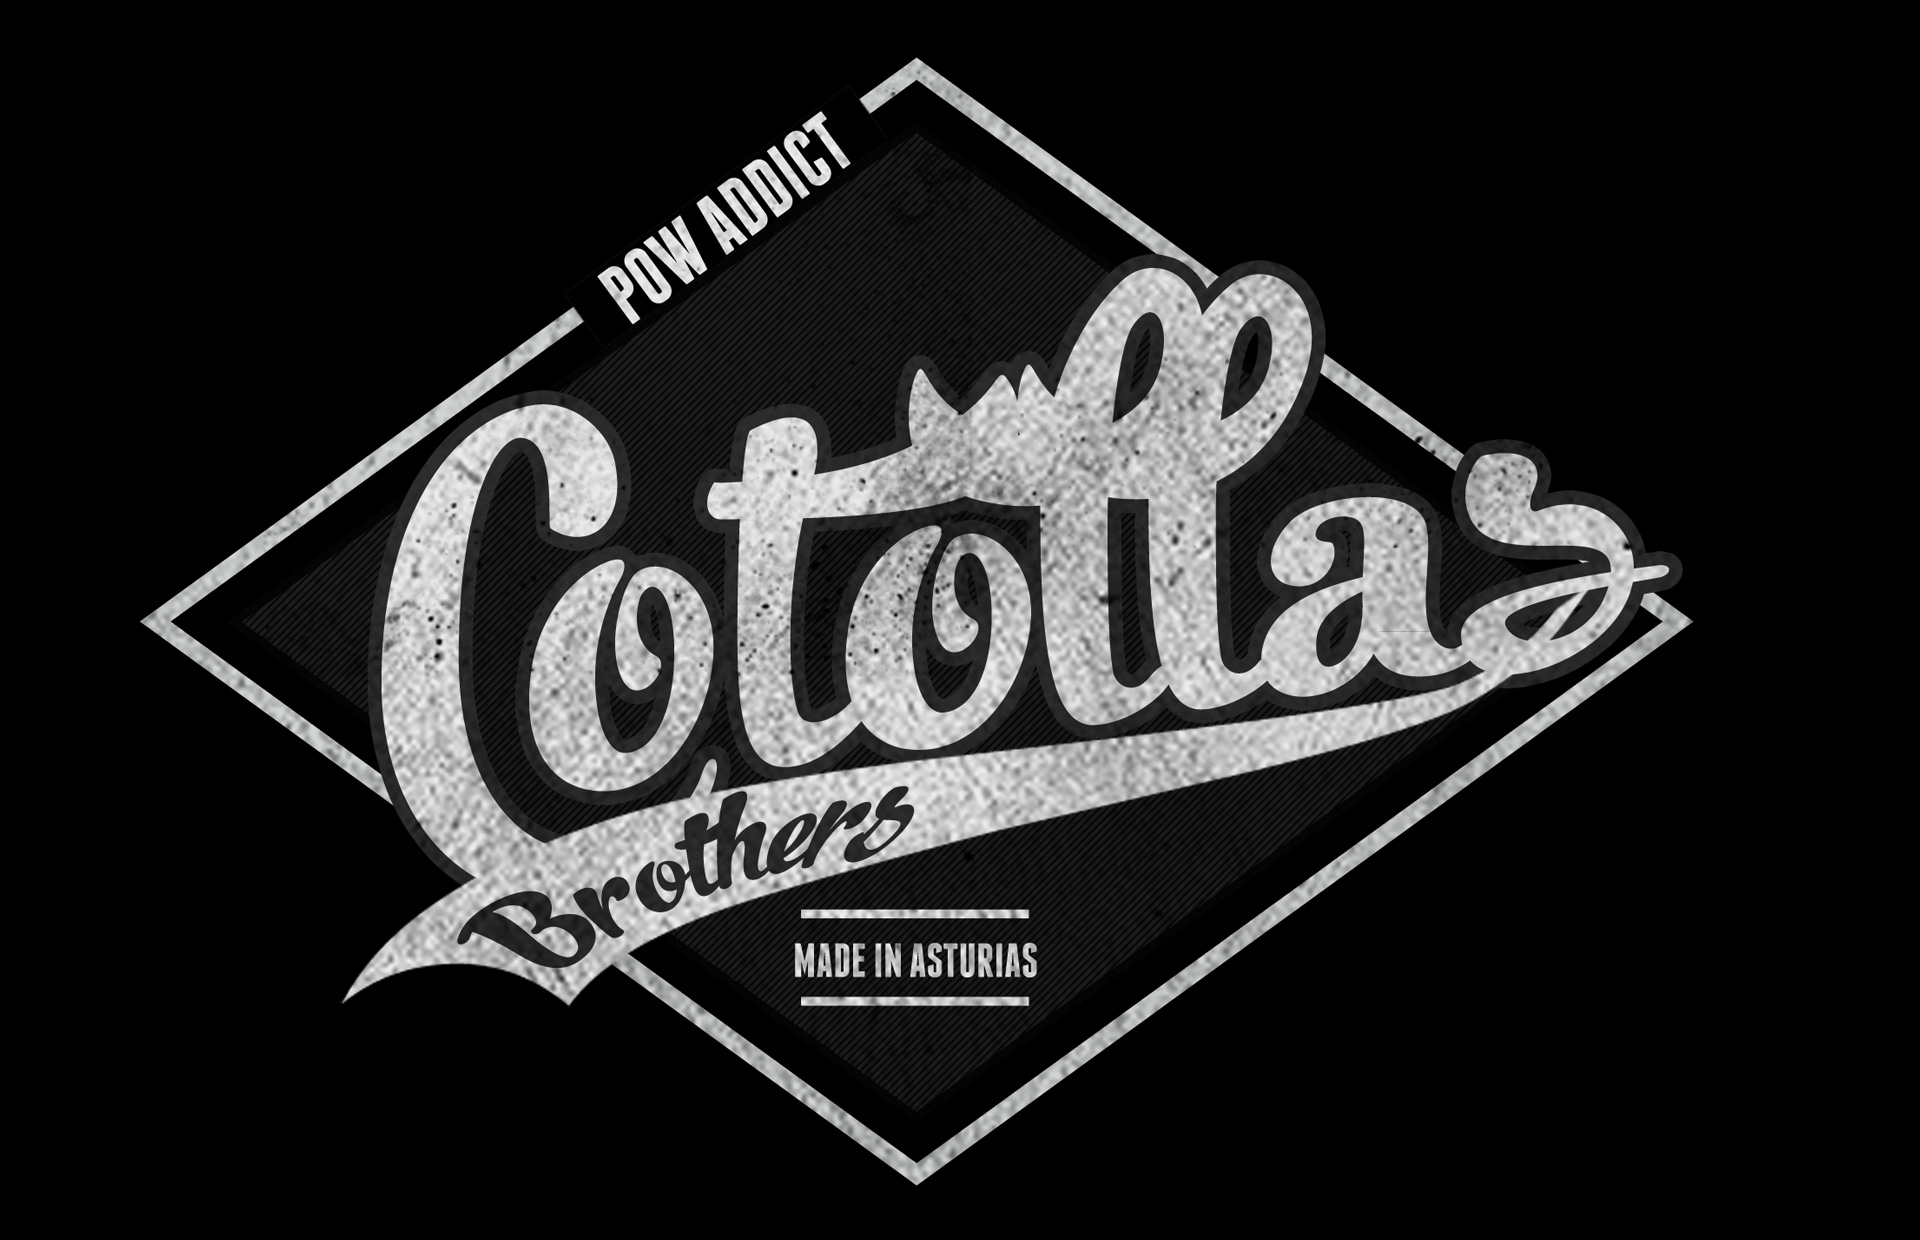 ✨ Logotipo Cotollas Brothers